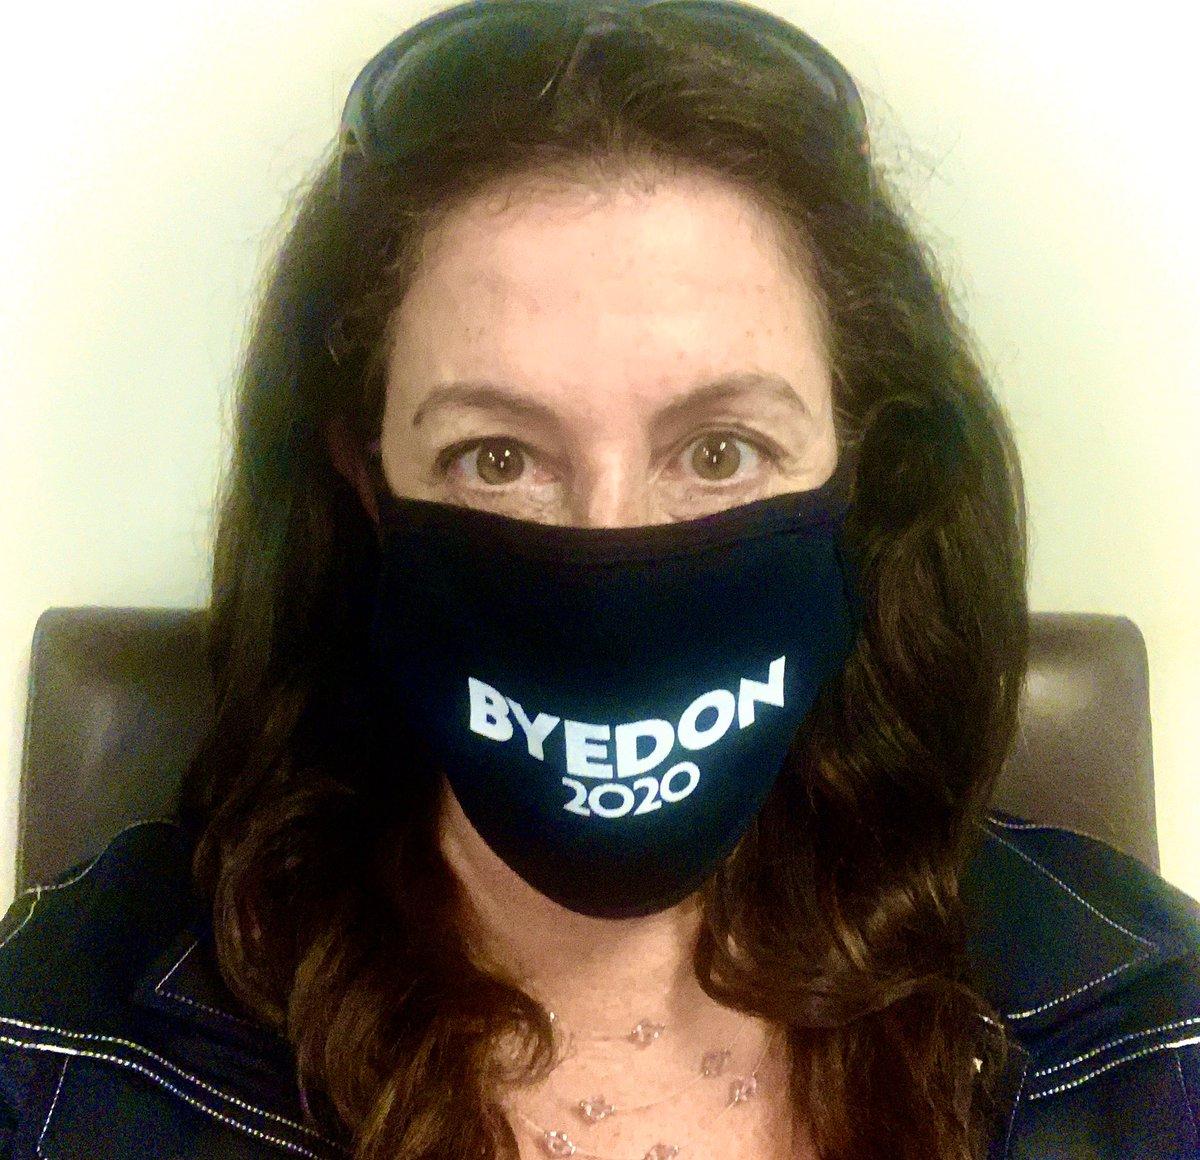 161 Days to go ... #BYEDON #TuesdayMotivation <br>http://pic.twitter.com/IkqXSRl869